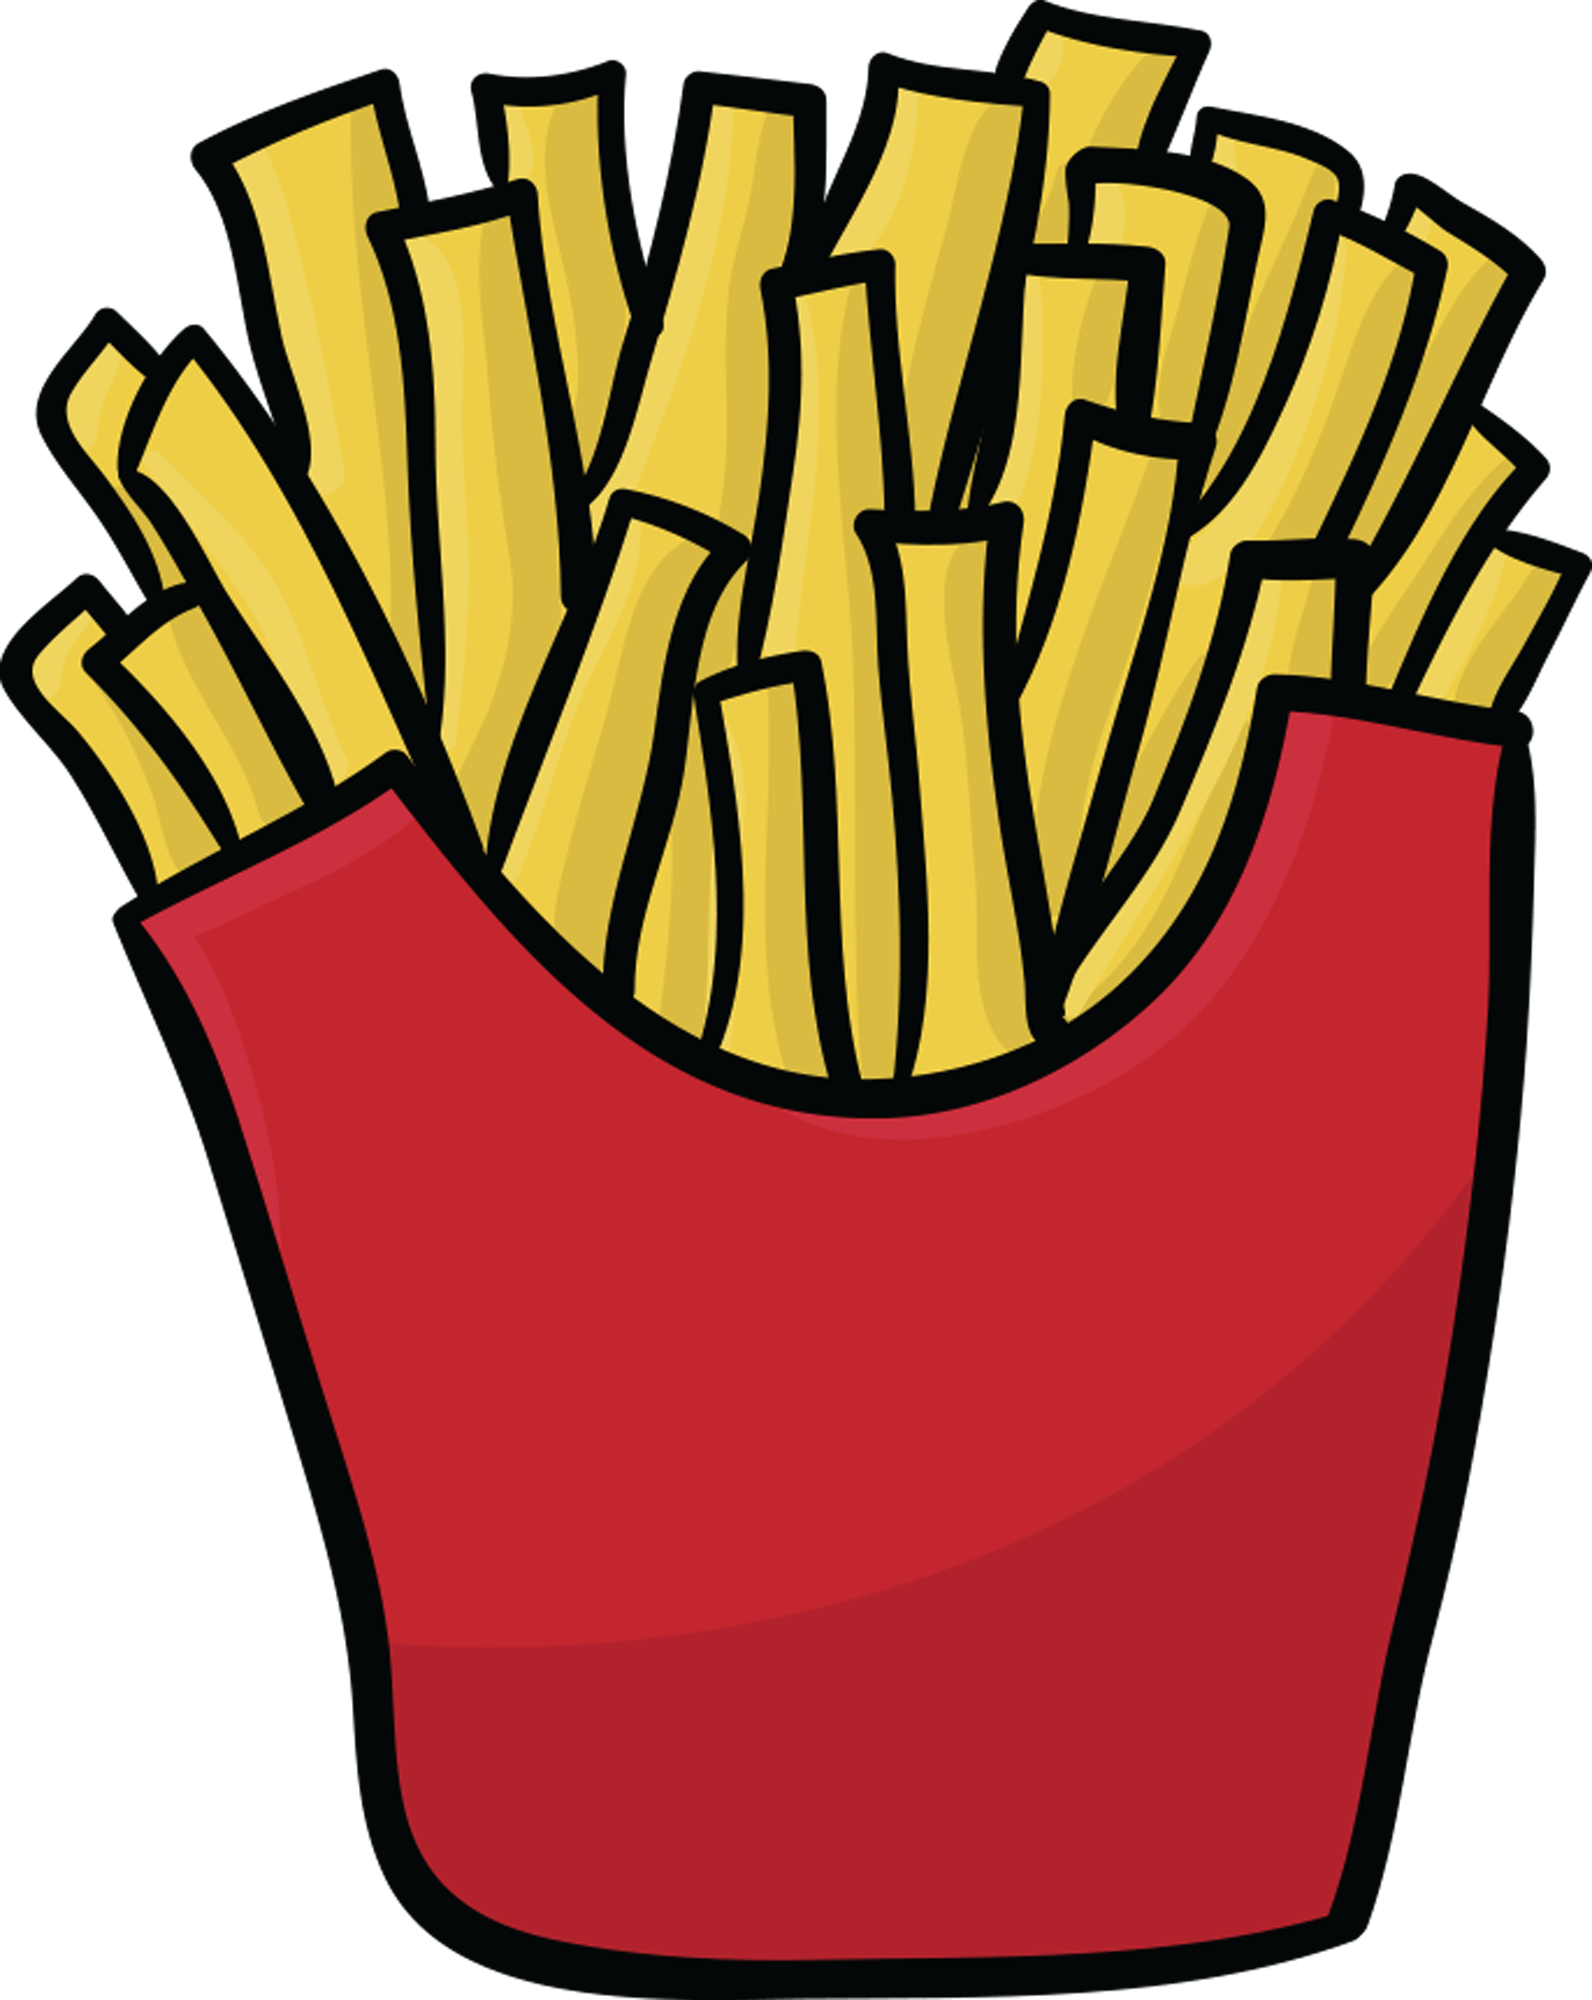 Junk Food Sticker & Emoji Pack for iMessage messages sticker-6